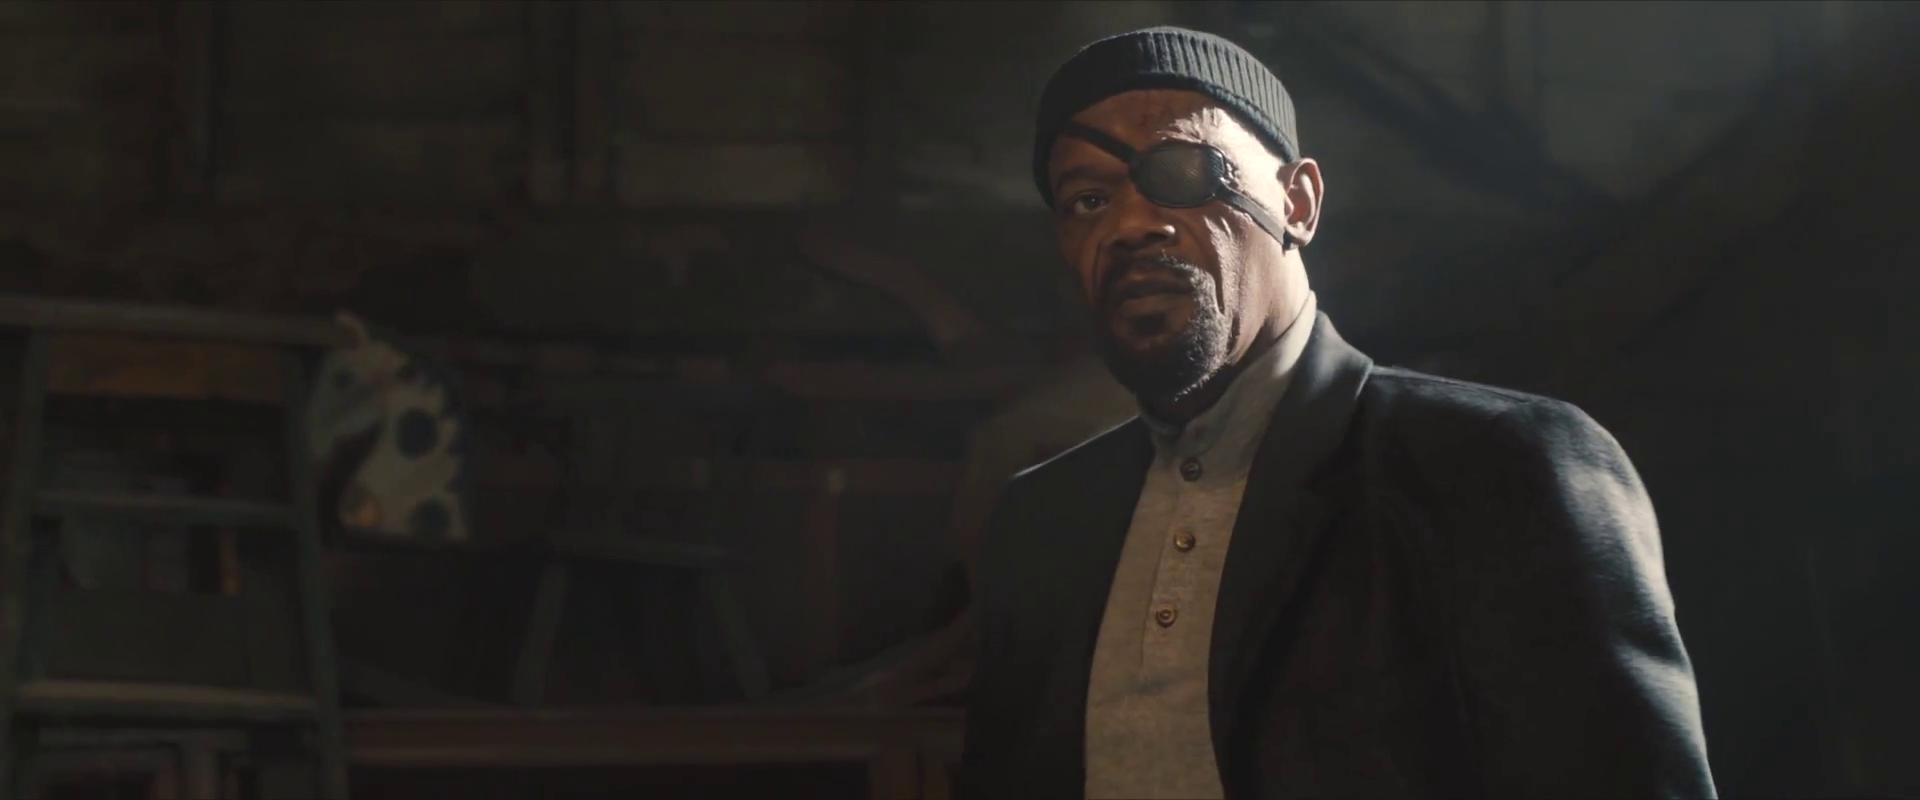 avengers-age-of-ultron-trailer-screengrab-14-samuel-l-jackson.png